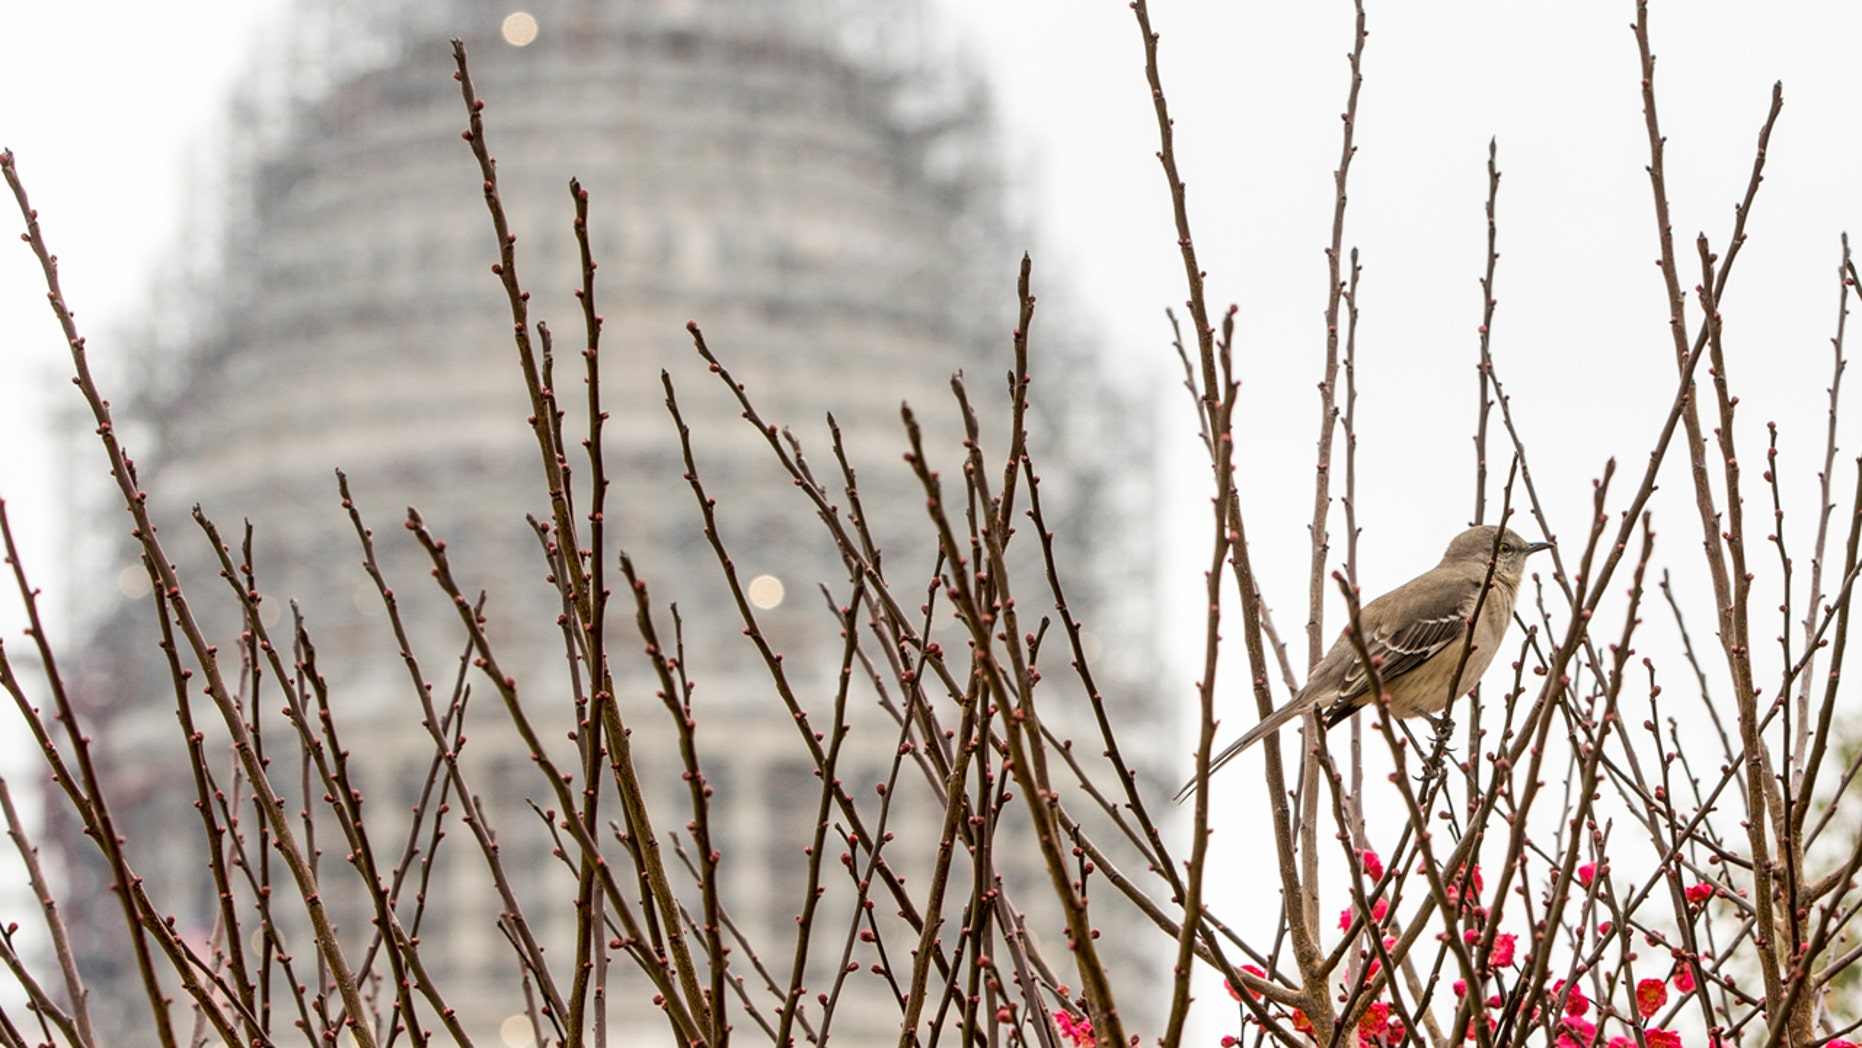 FILE -- Dec. 30, 2015: A bird sits among the winterberries at the U.S. Botanic Garden on Capitol Hill in Washington. (AP Photo/J. Scott Applewhite)